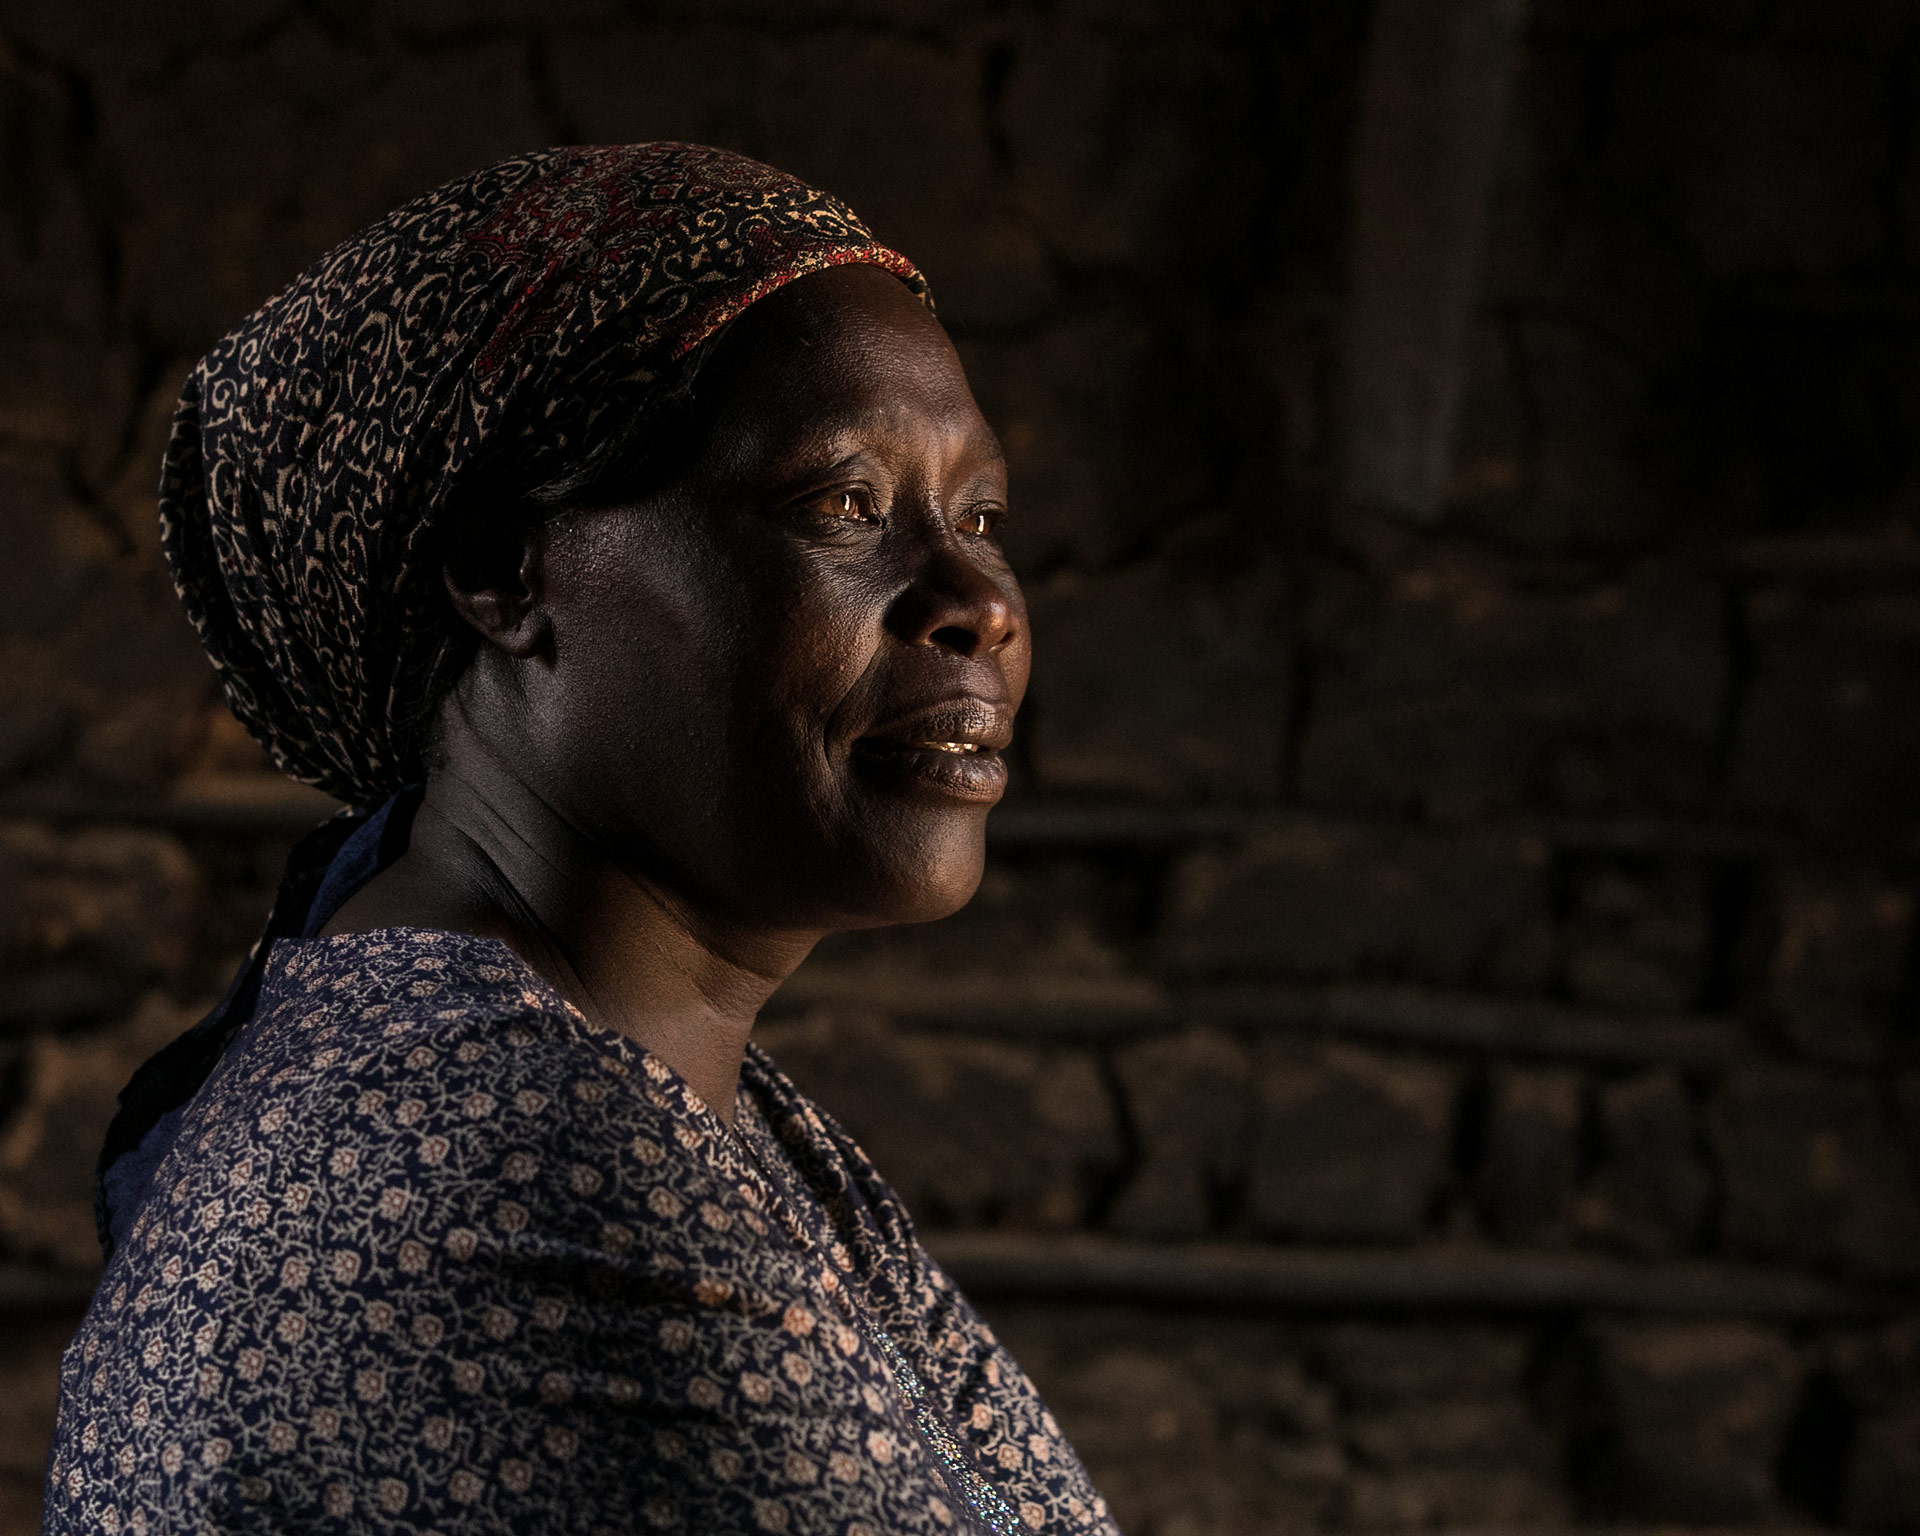 stufa salomè ritratto matteo de mayda kenya mani tese 2018